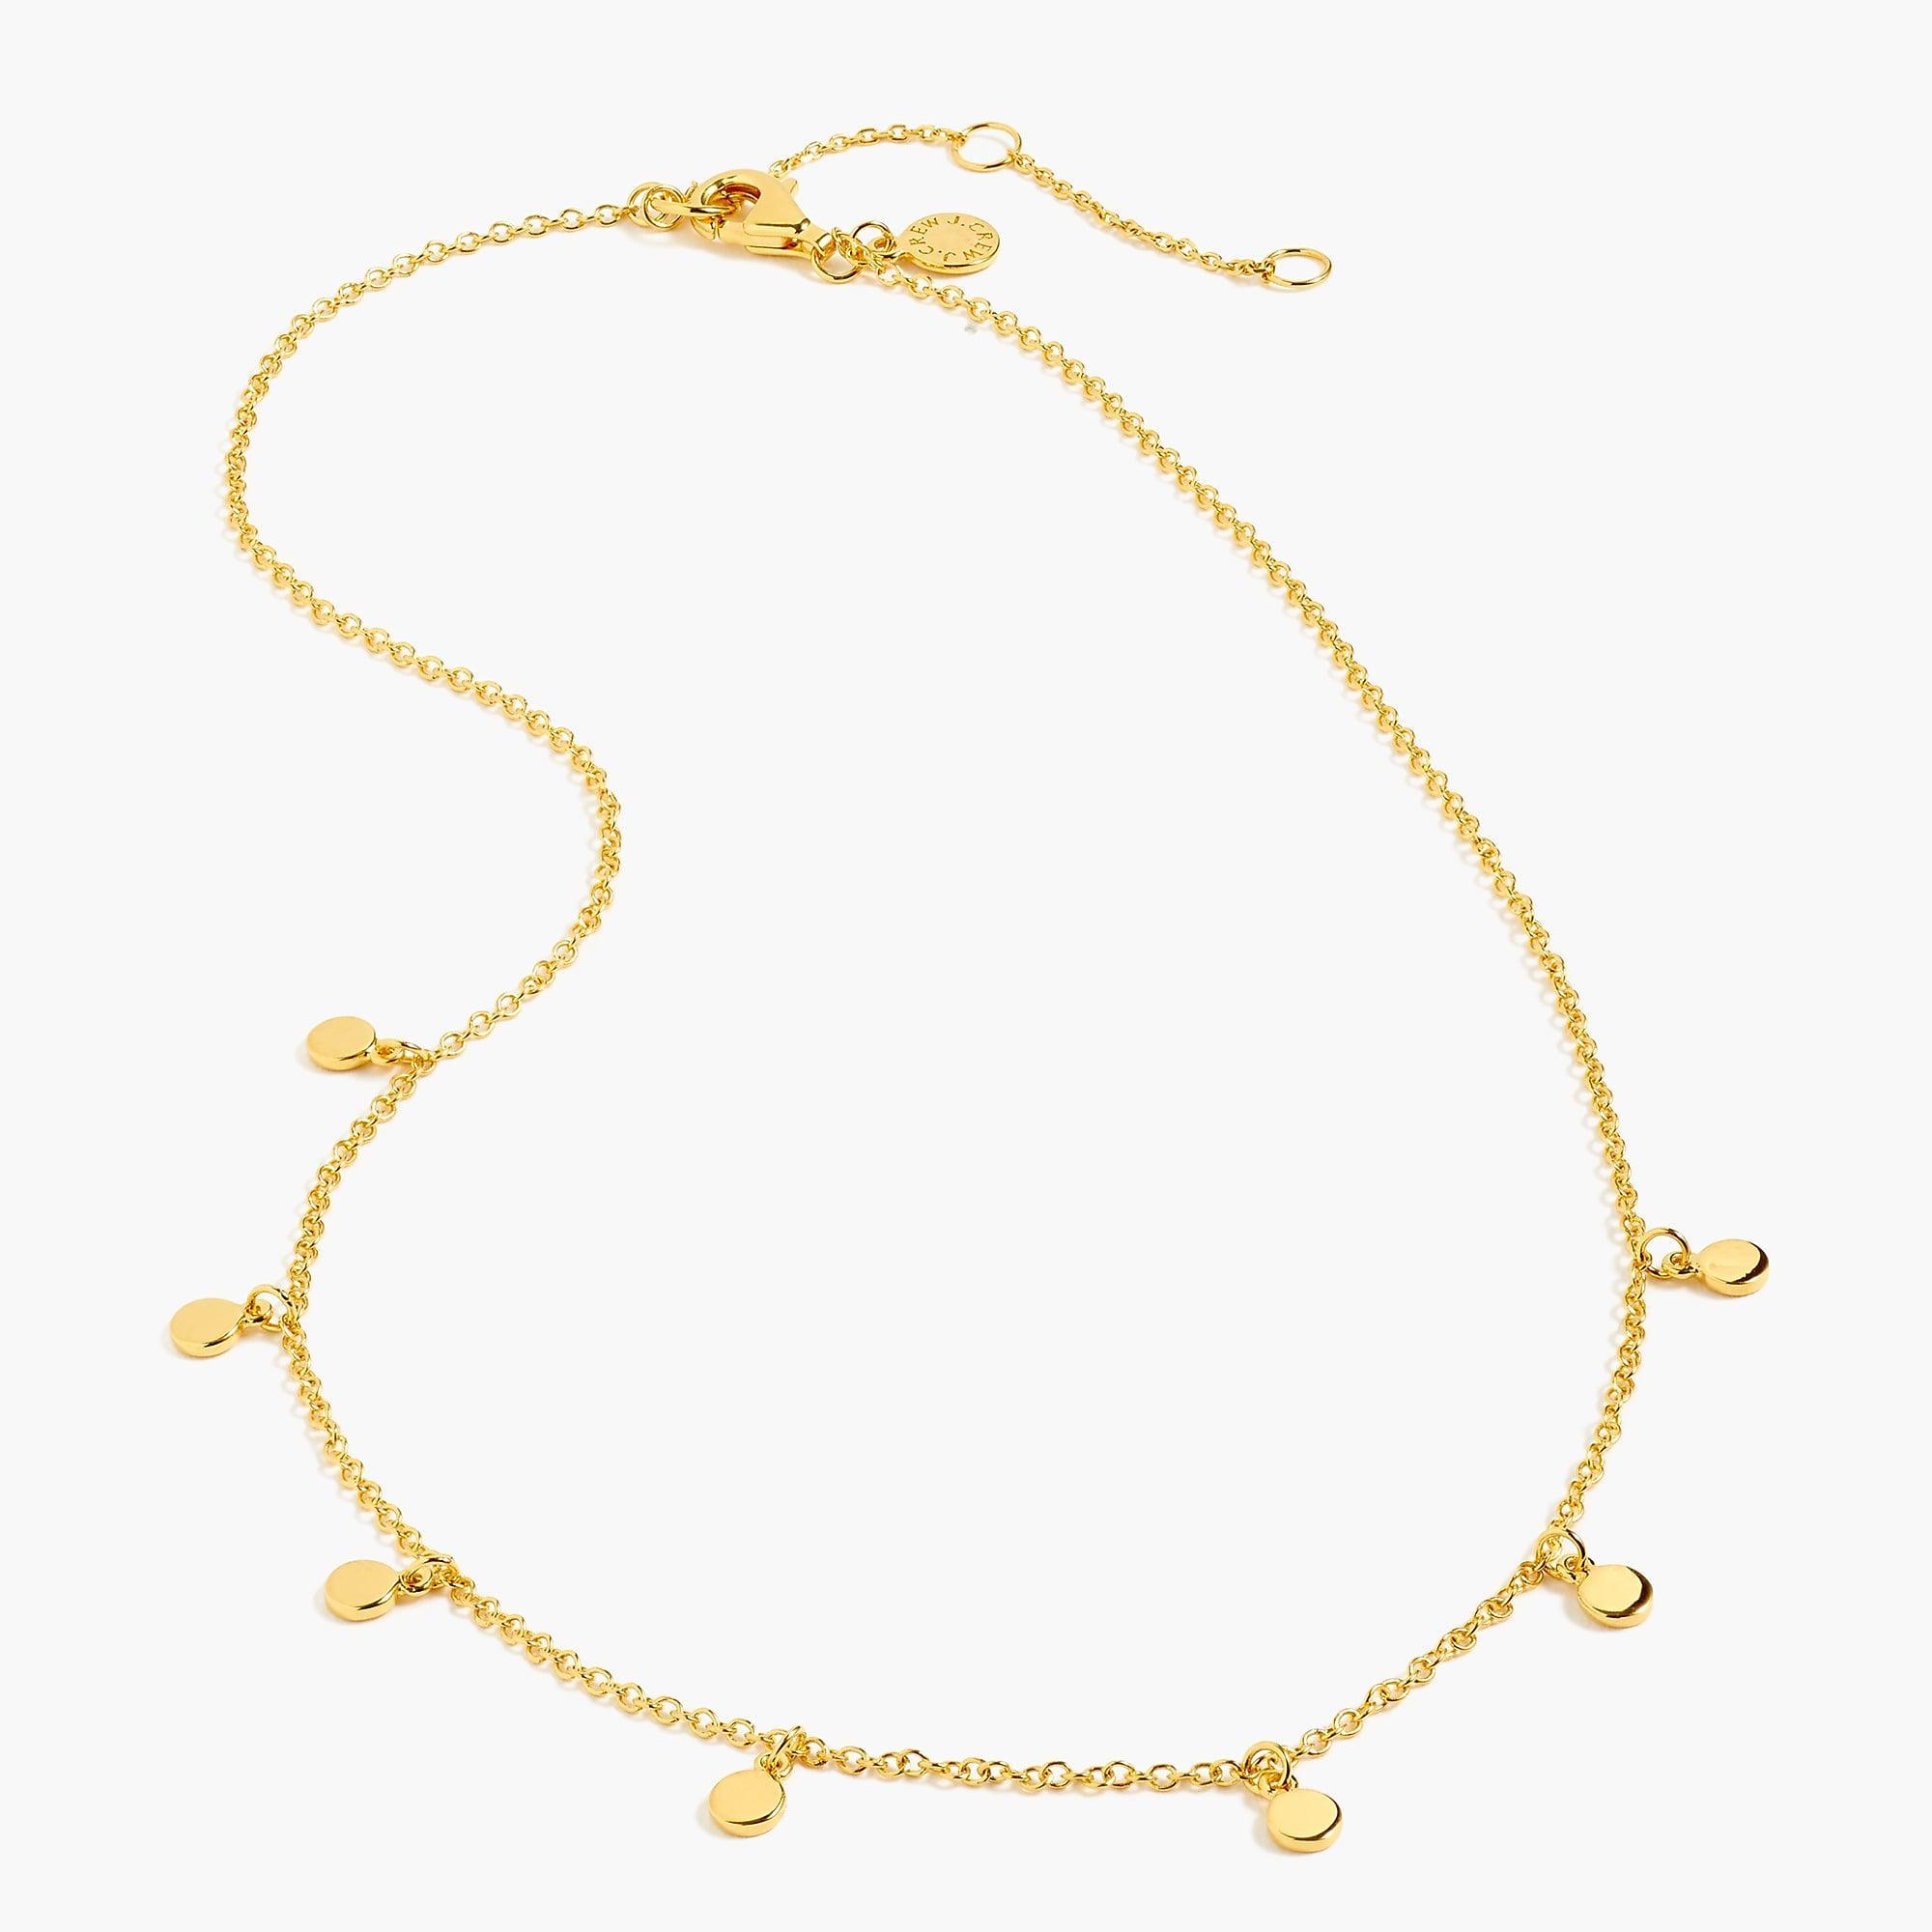 2e4993fa07c Tap to visit site. J.Crew Metallic Demi-fine 14k Gold-plated Dot Charm  Necklace